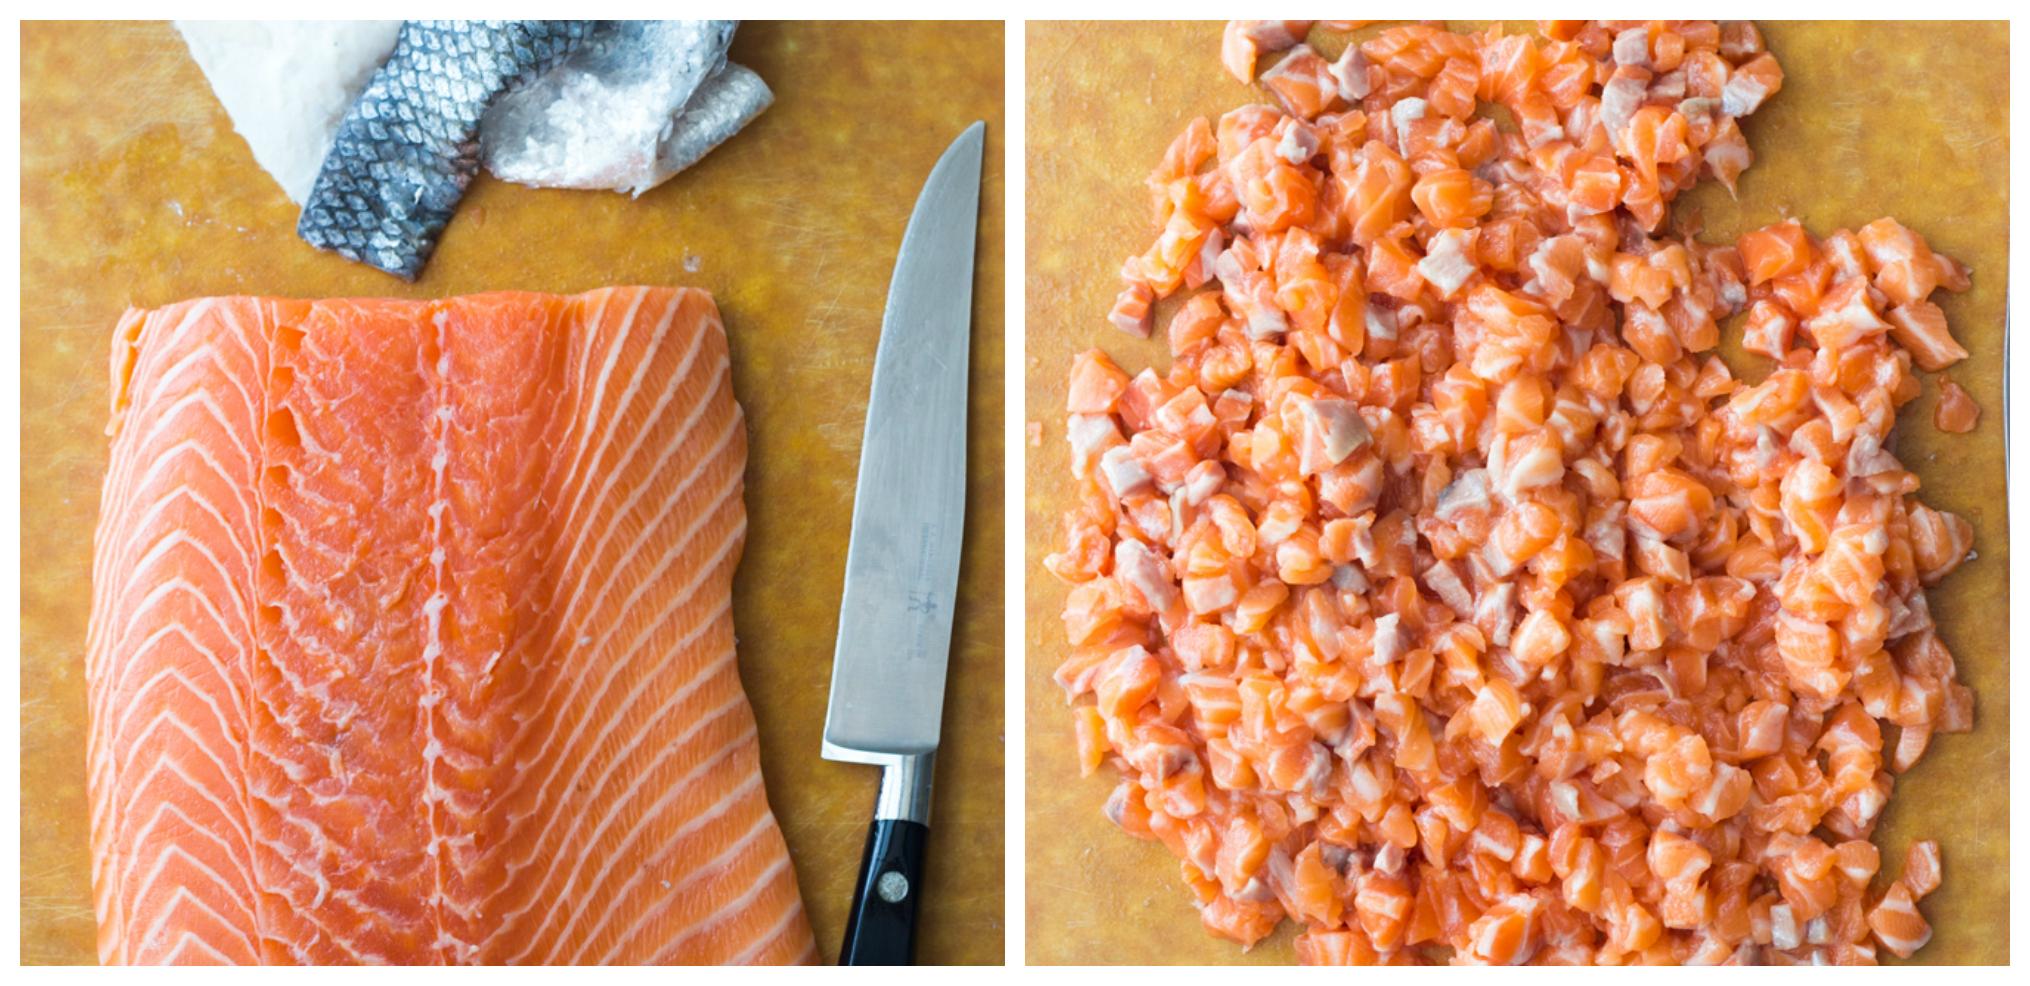 chopped up salmon on cutting board